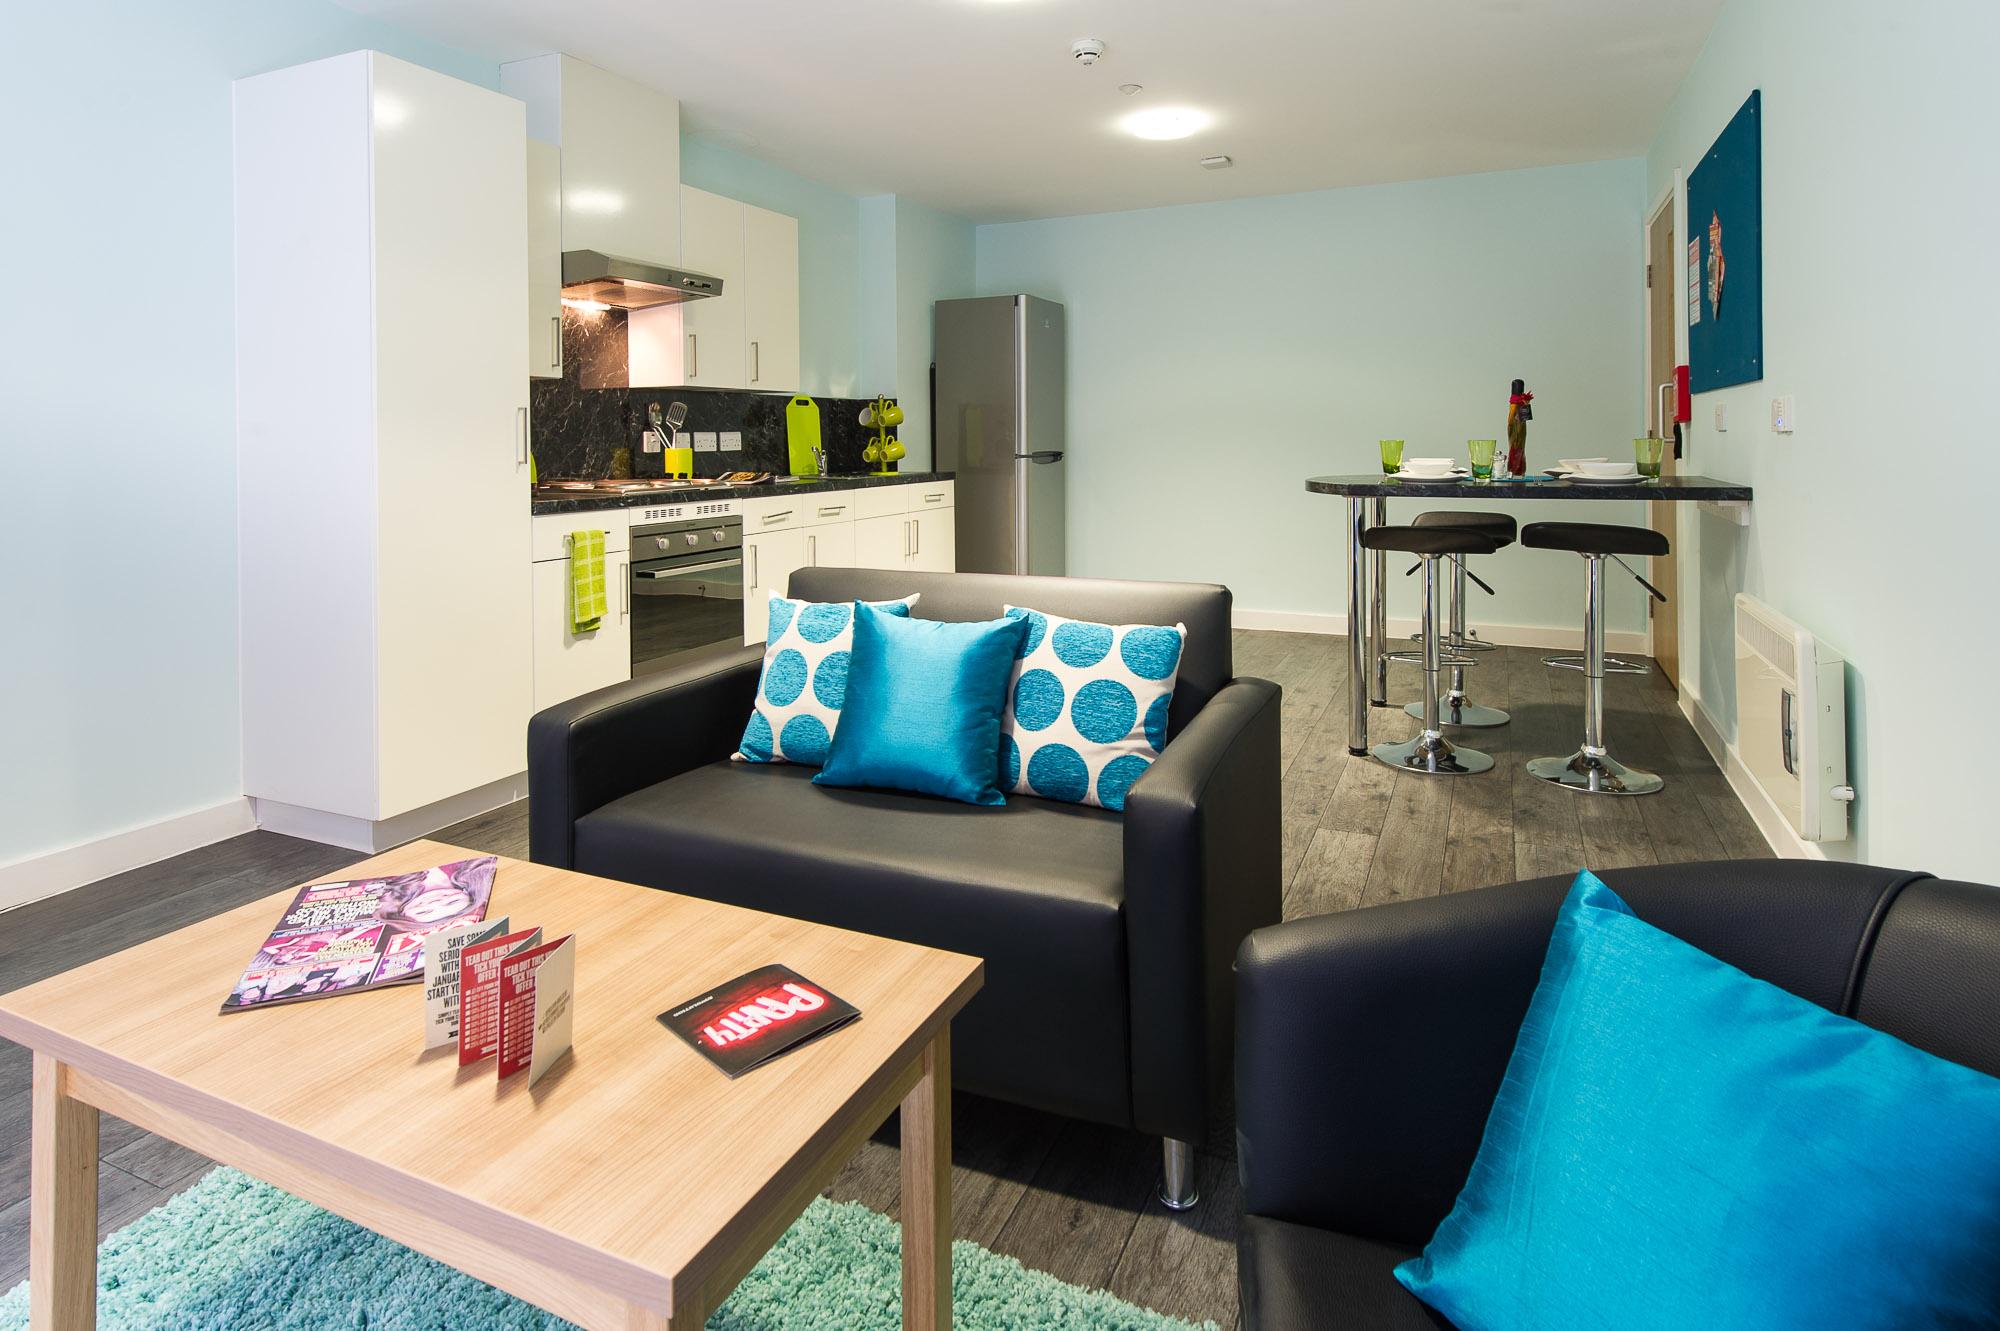 A social space and kitchen at Darley Bank